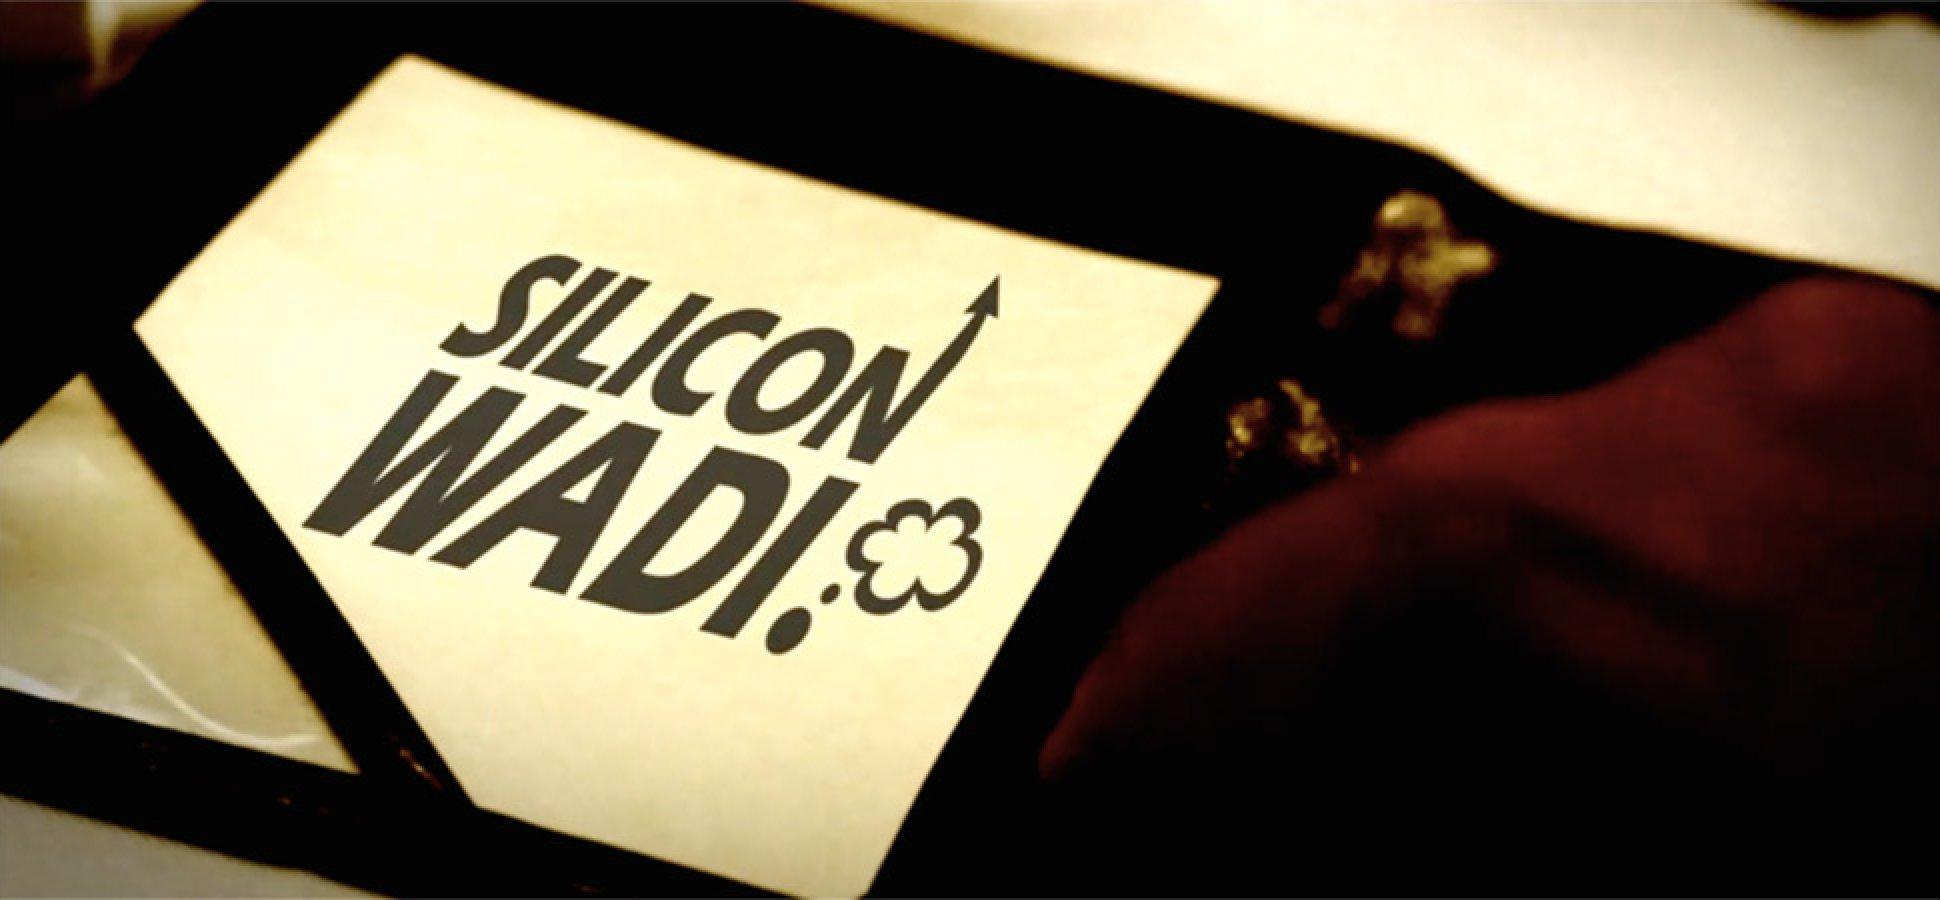 siliconwadi-placeholder-web_70226